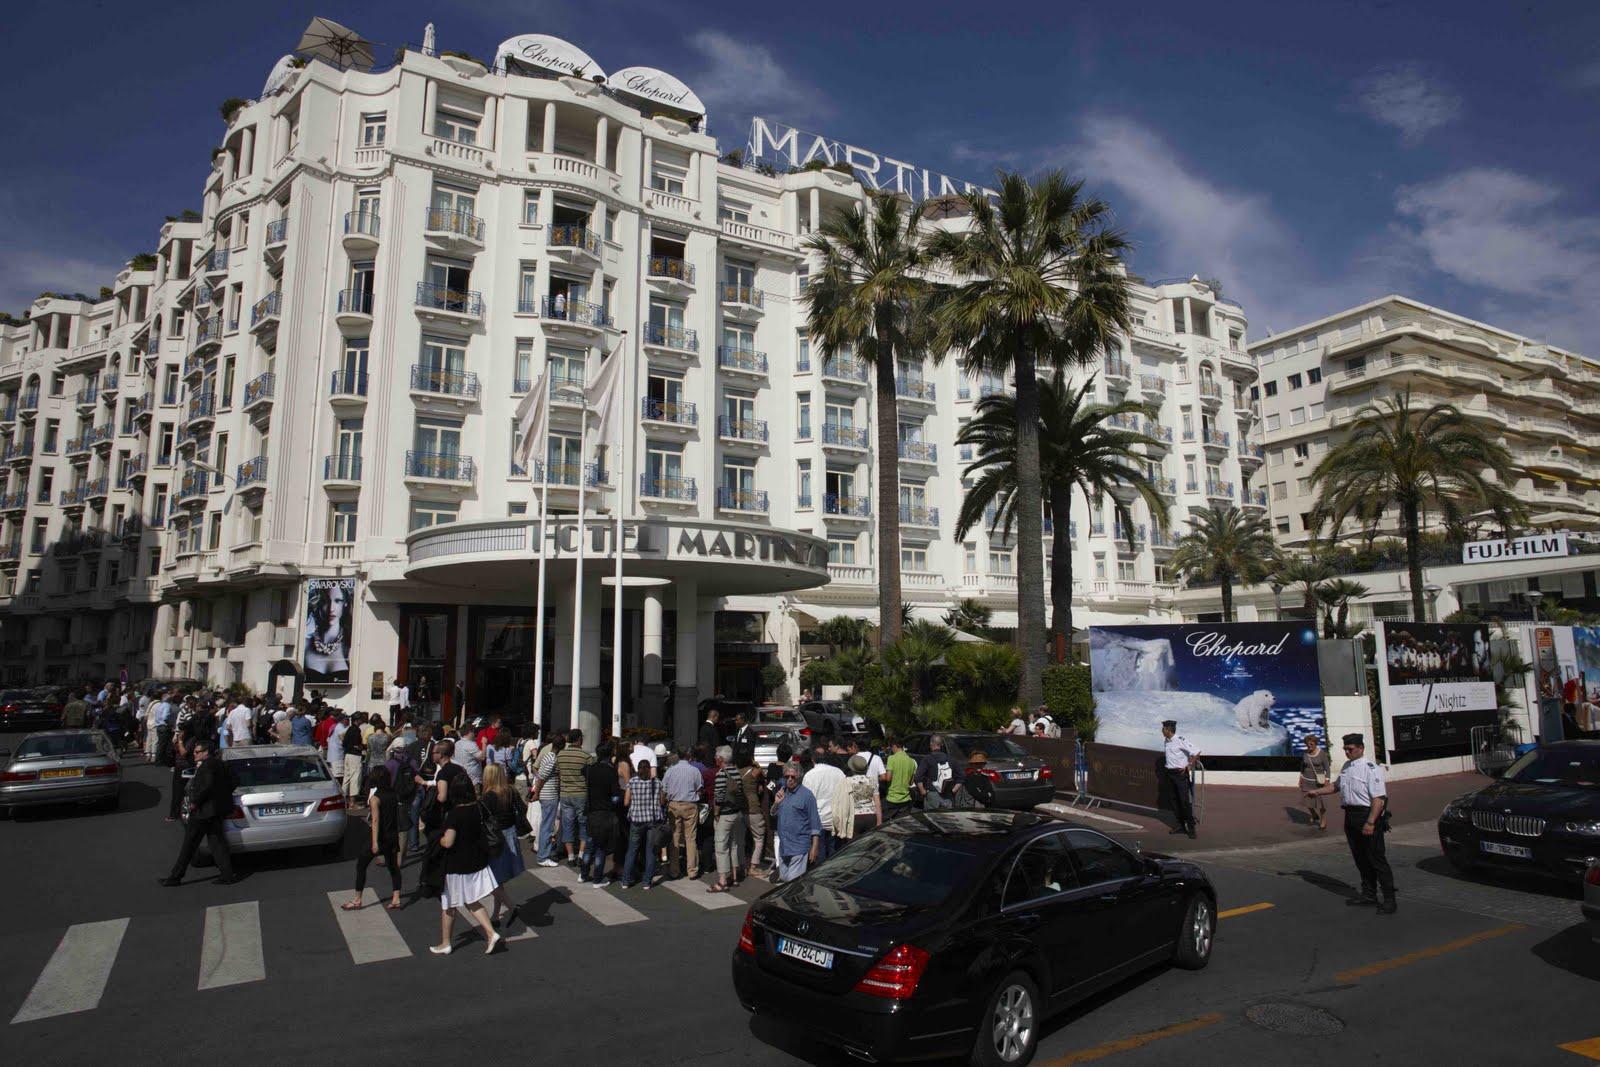 http://2.bp.blogspot.com/-1DcQp4Pu8Vg/TdBcjKuJoGI/AAAAAAAAAno/pxgYHyojNXY/s1600/Hotel-Martinez-during-the-Cannes-Film-Festival.jpg